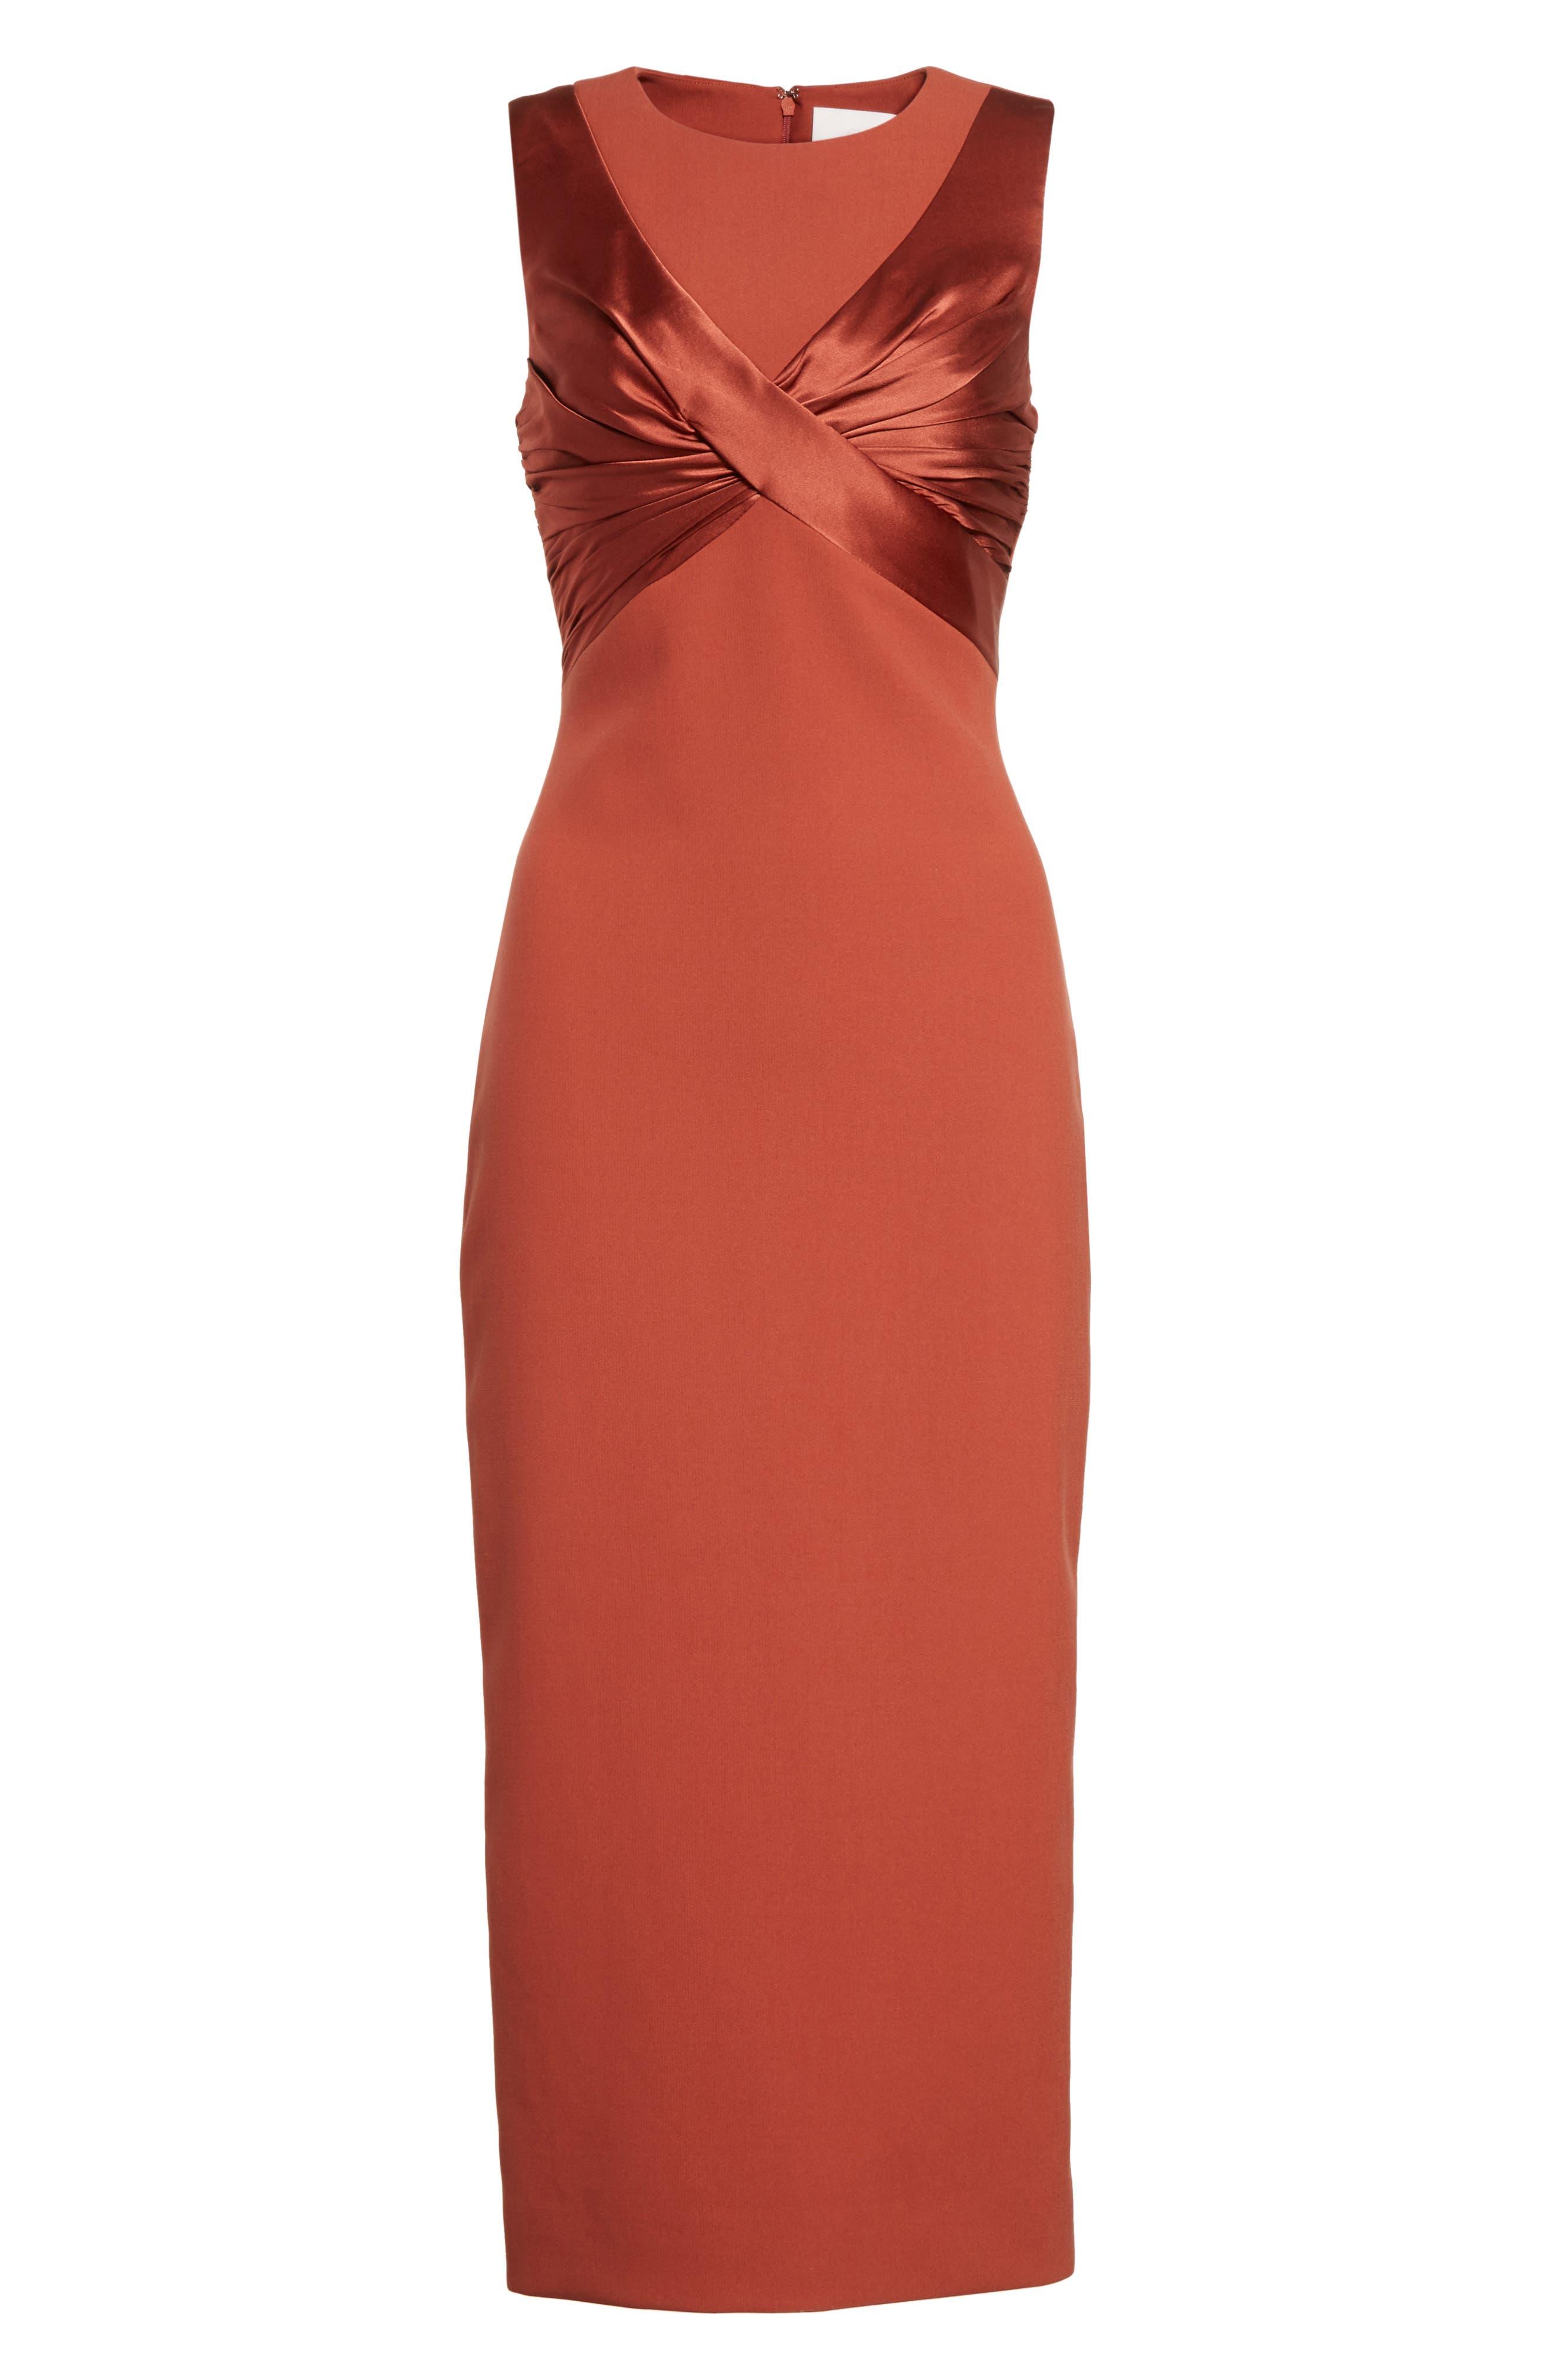 Adelise Crossover Sleeveless Sheath Dress,                             Alternate thumbnail 6, color,                             845